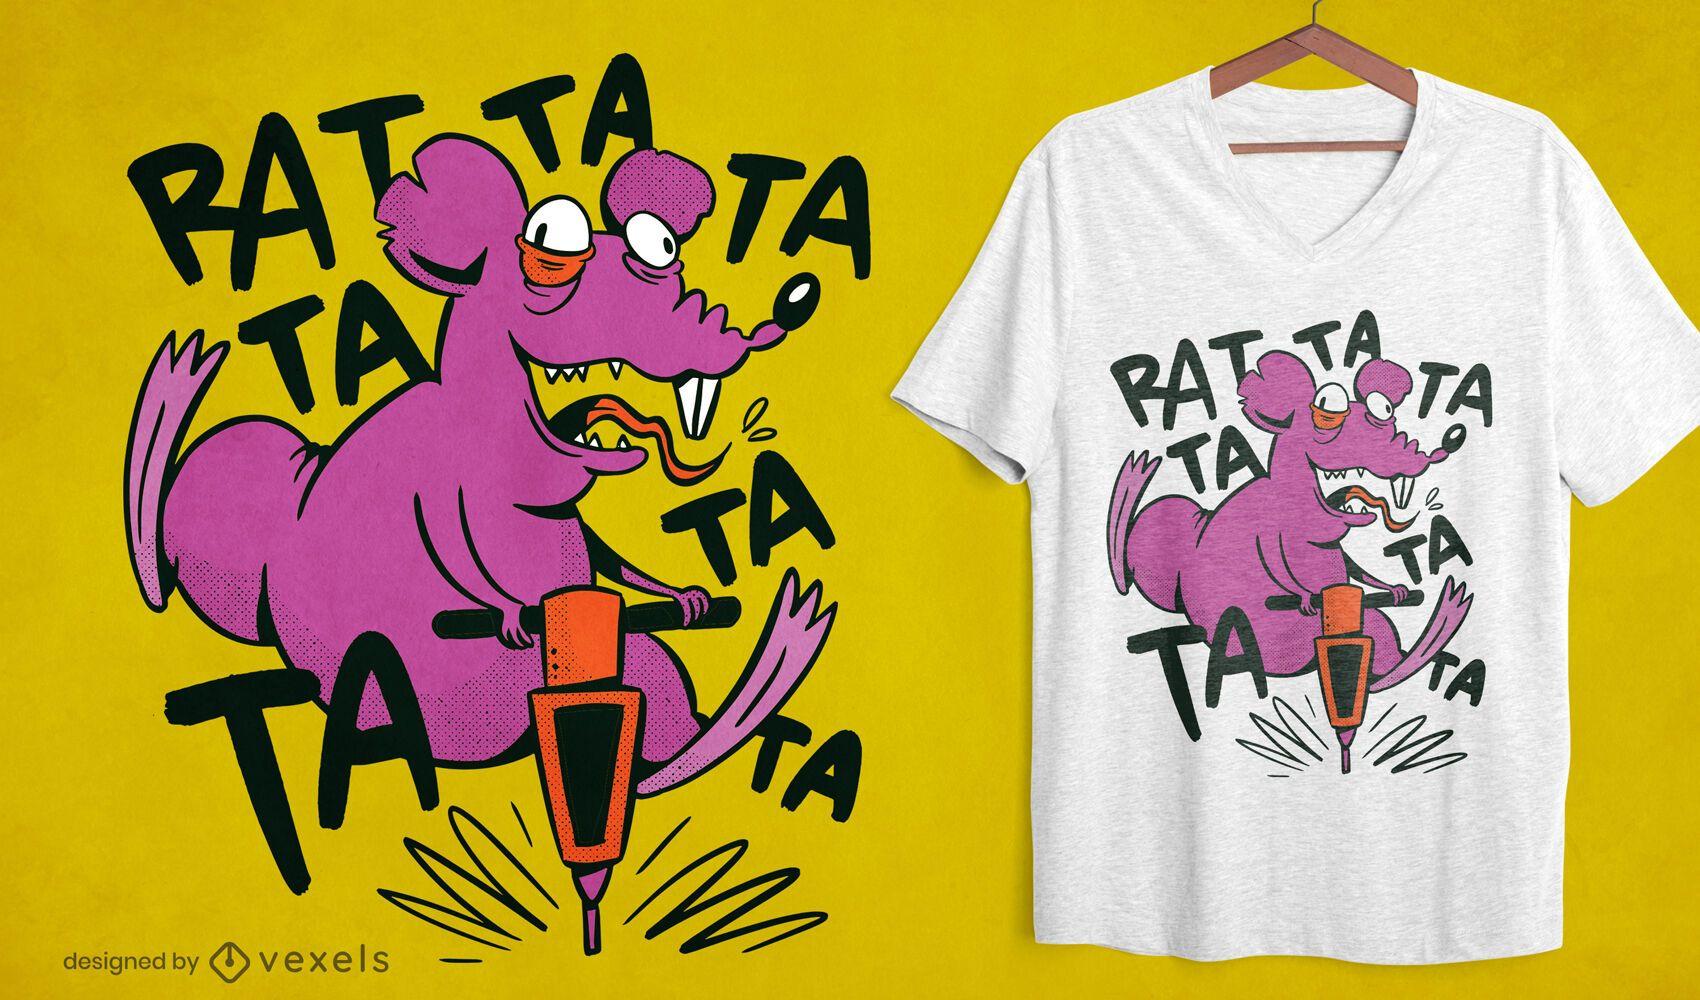 Crazy rat t-shirt design